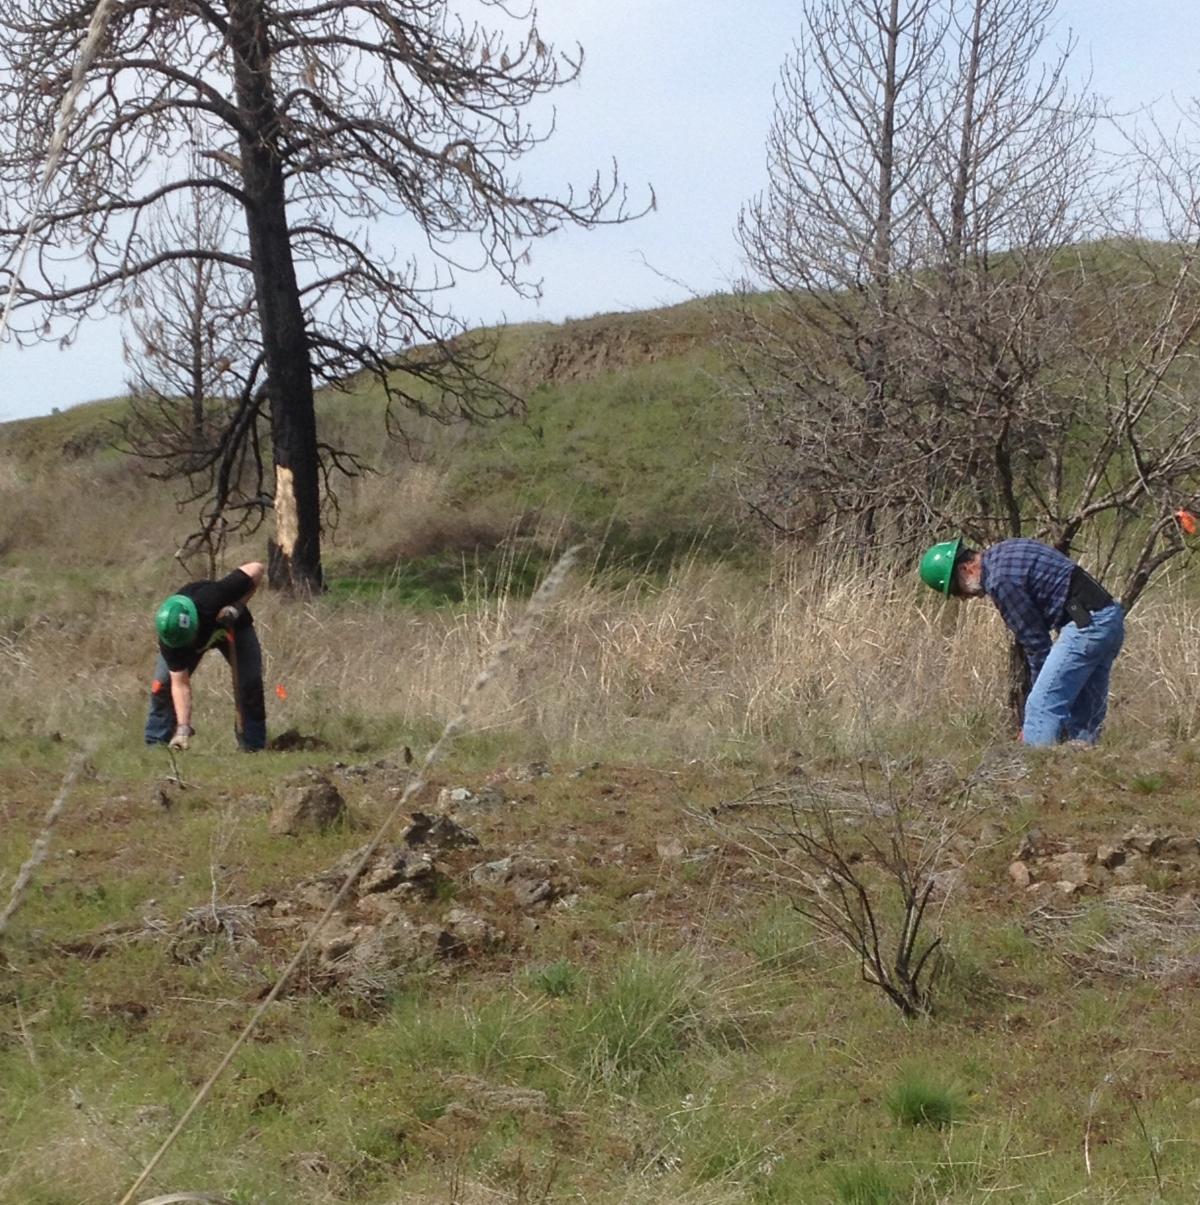 Clearing trail at Fish Trap Lake with Washington Trail Association